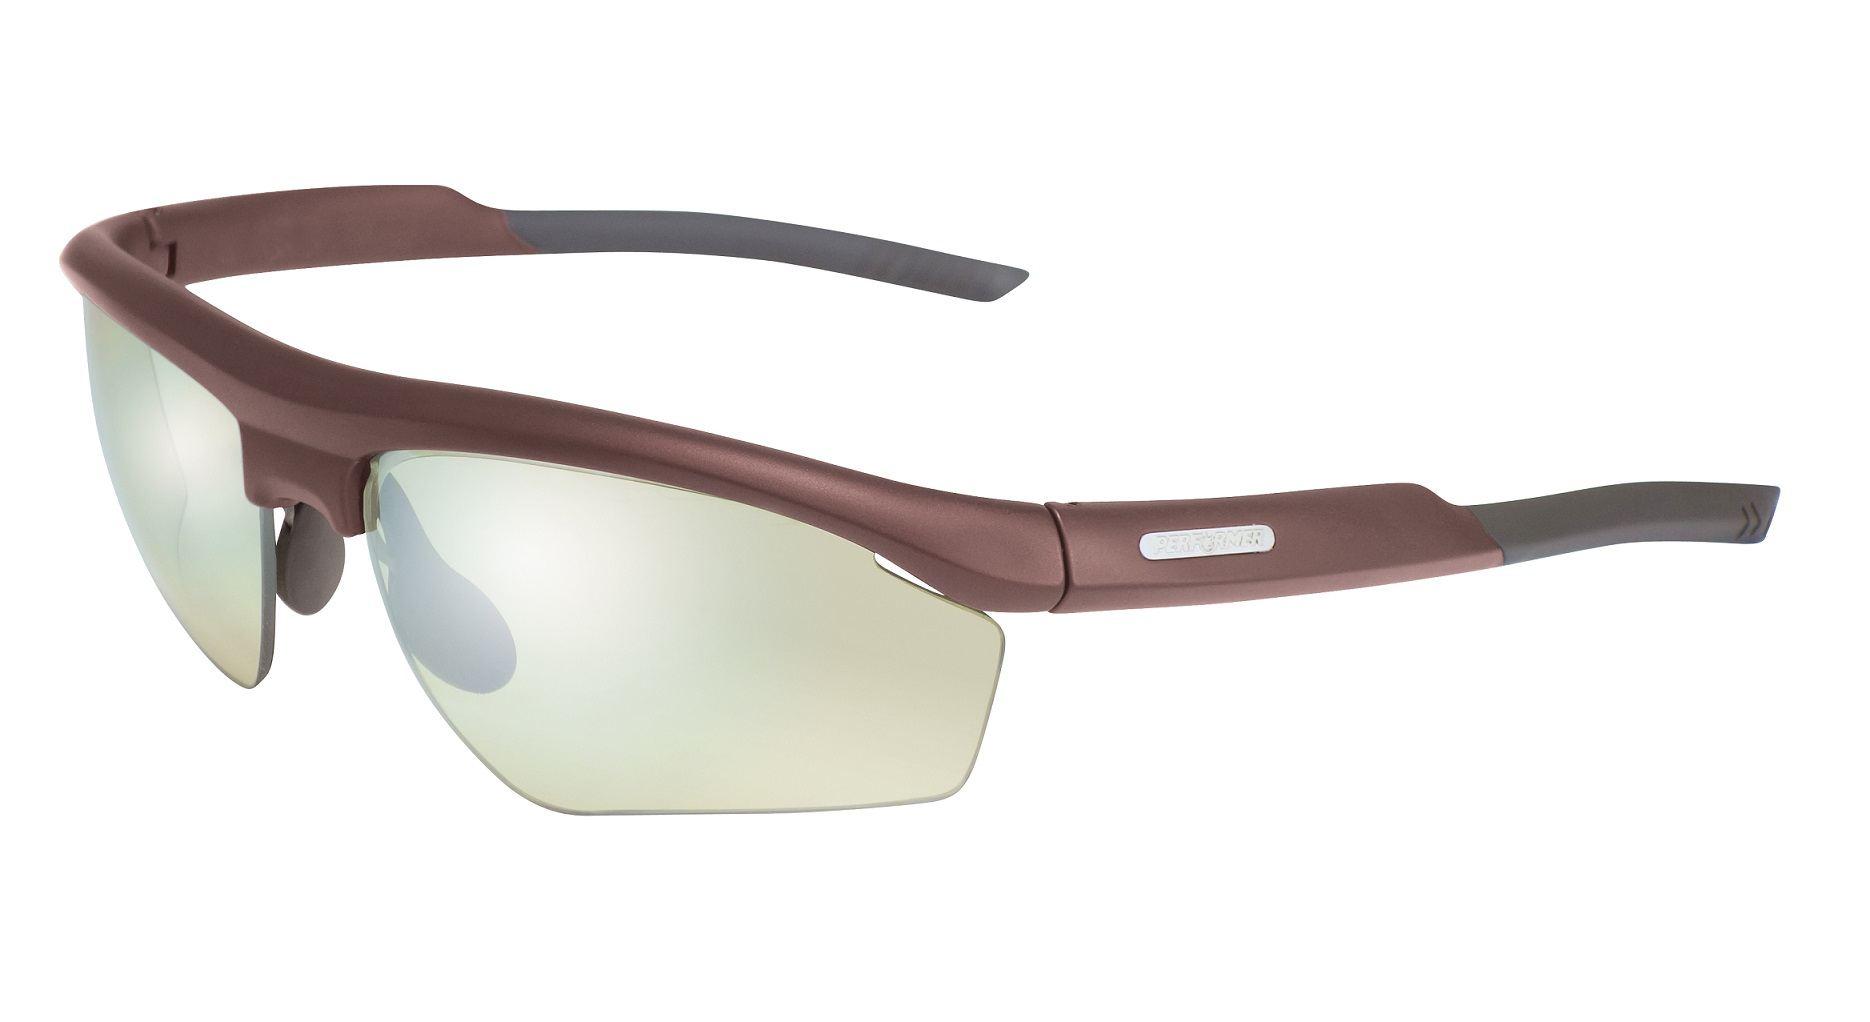 Performer Modell TTR 2.0 351 Sportbrille,Bikerbrille, Sonnenbrille